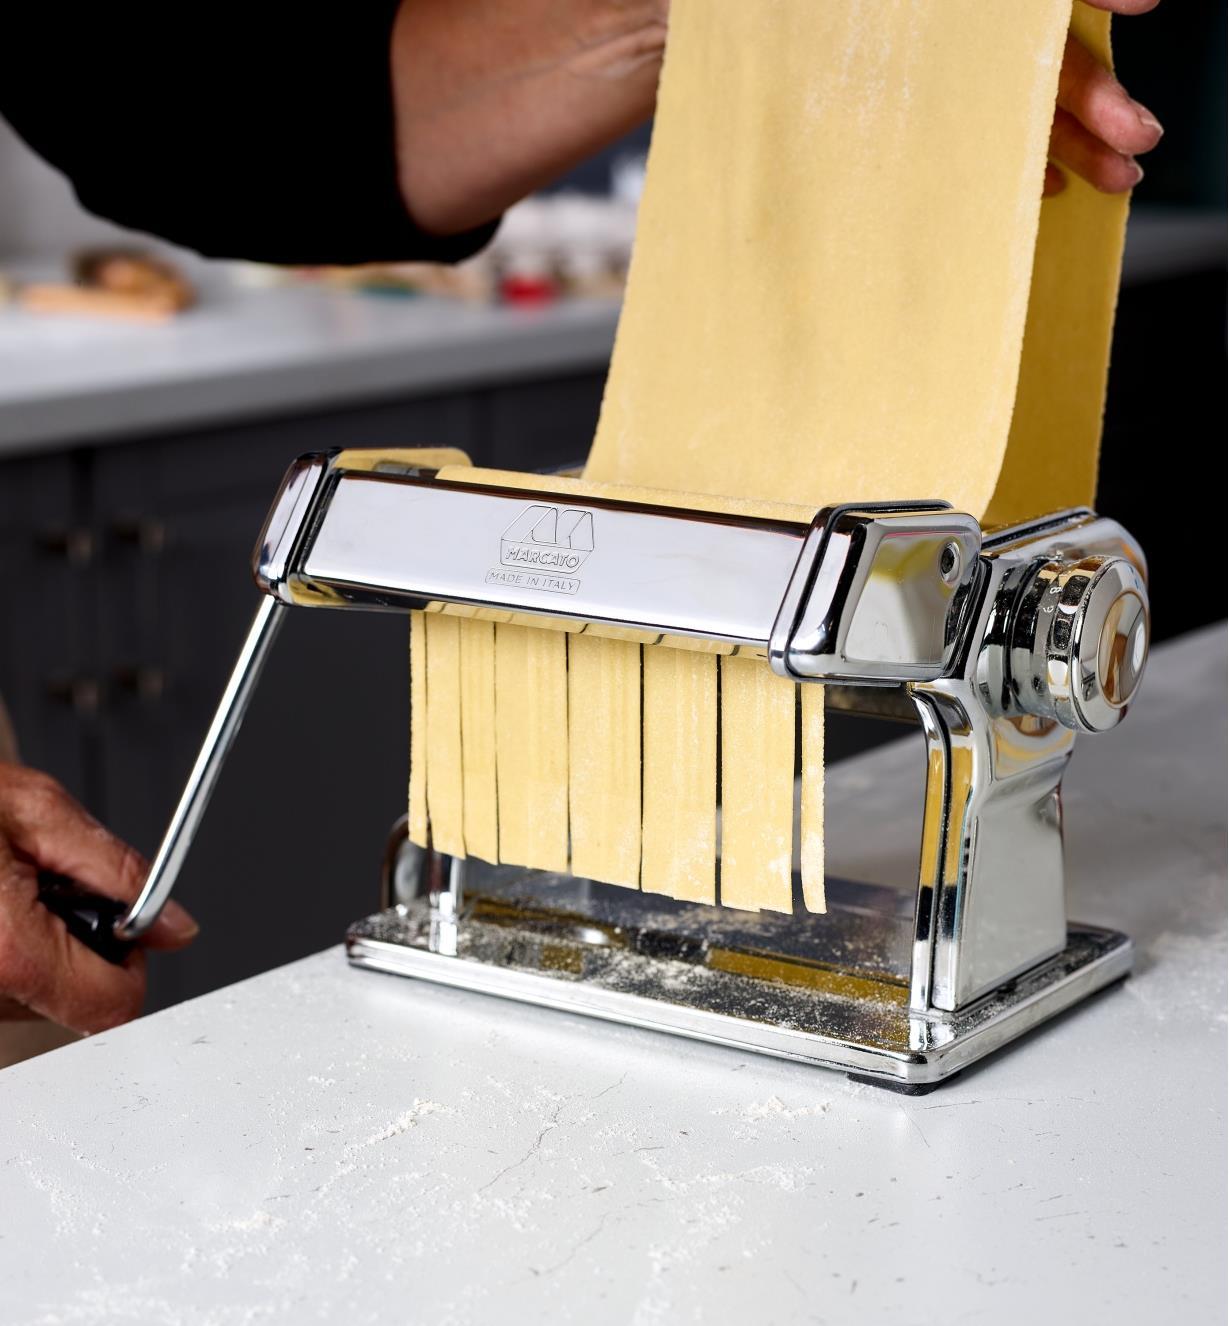 Making fresh lasagnette noodles using a Marcato pasta machine with the lasagnette cutter attachment